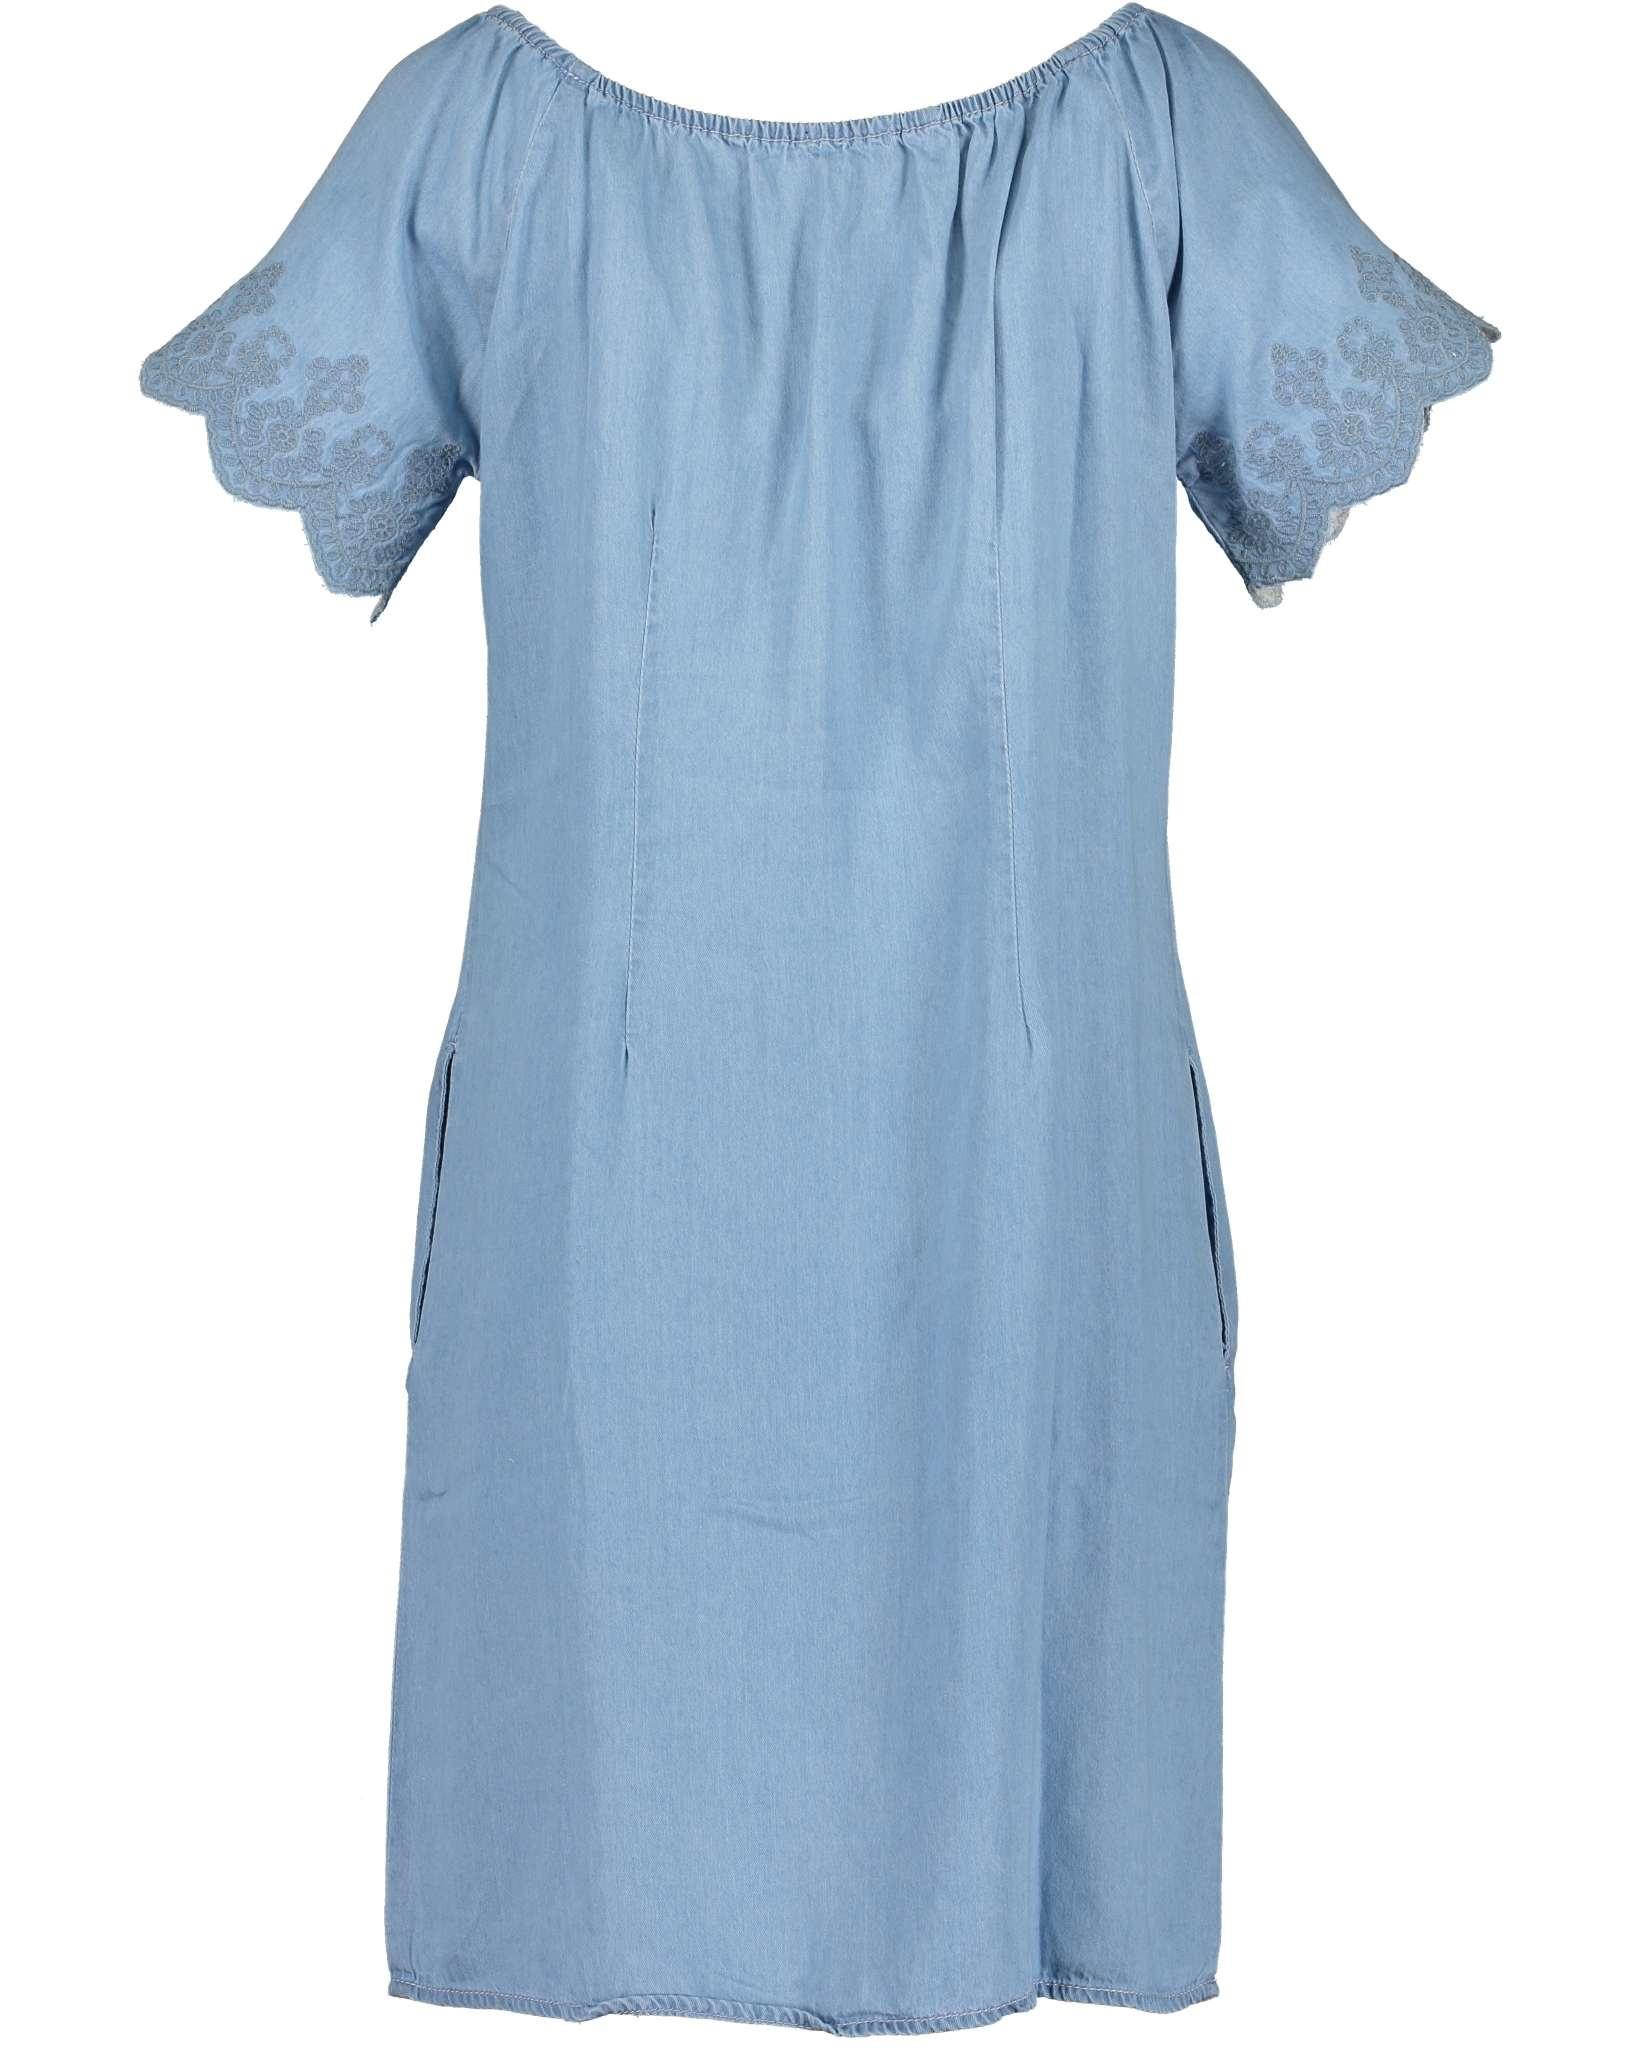 Blue Seven Blue Seven jurk Carmen jeans